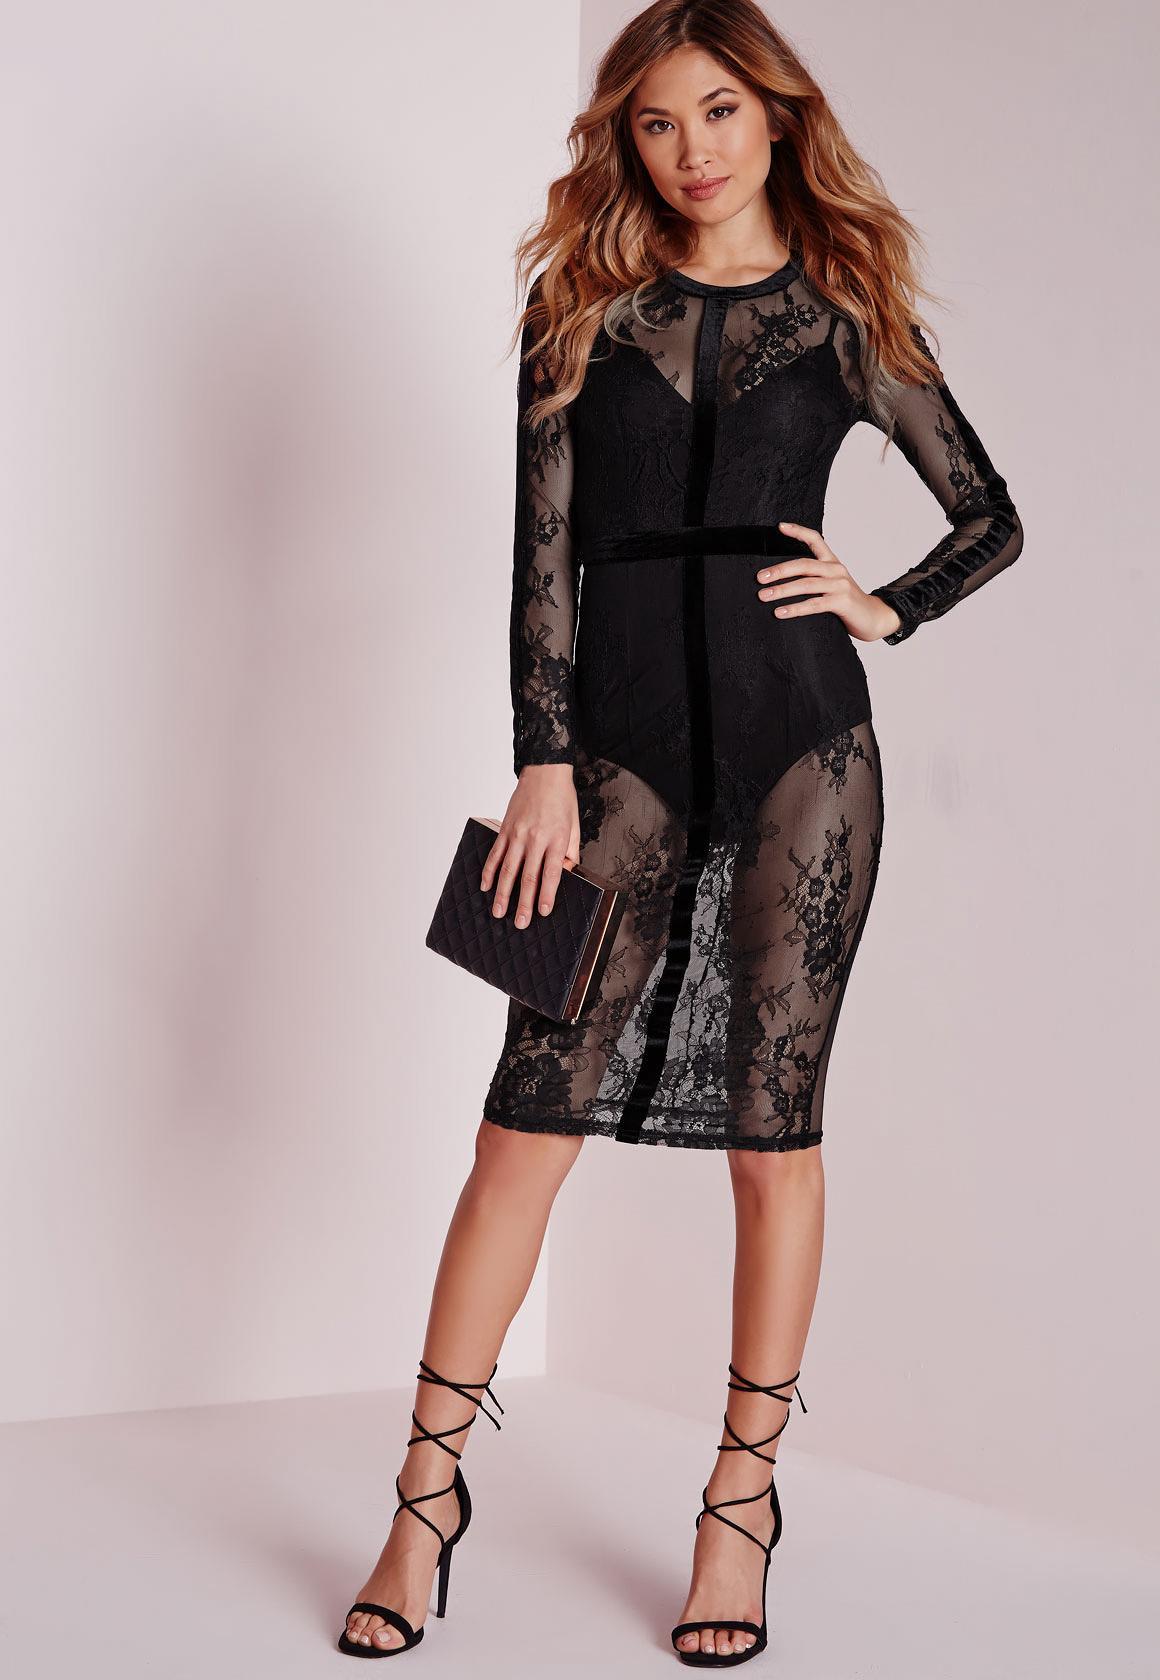 Lace velvet dress next